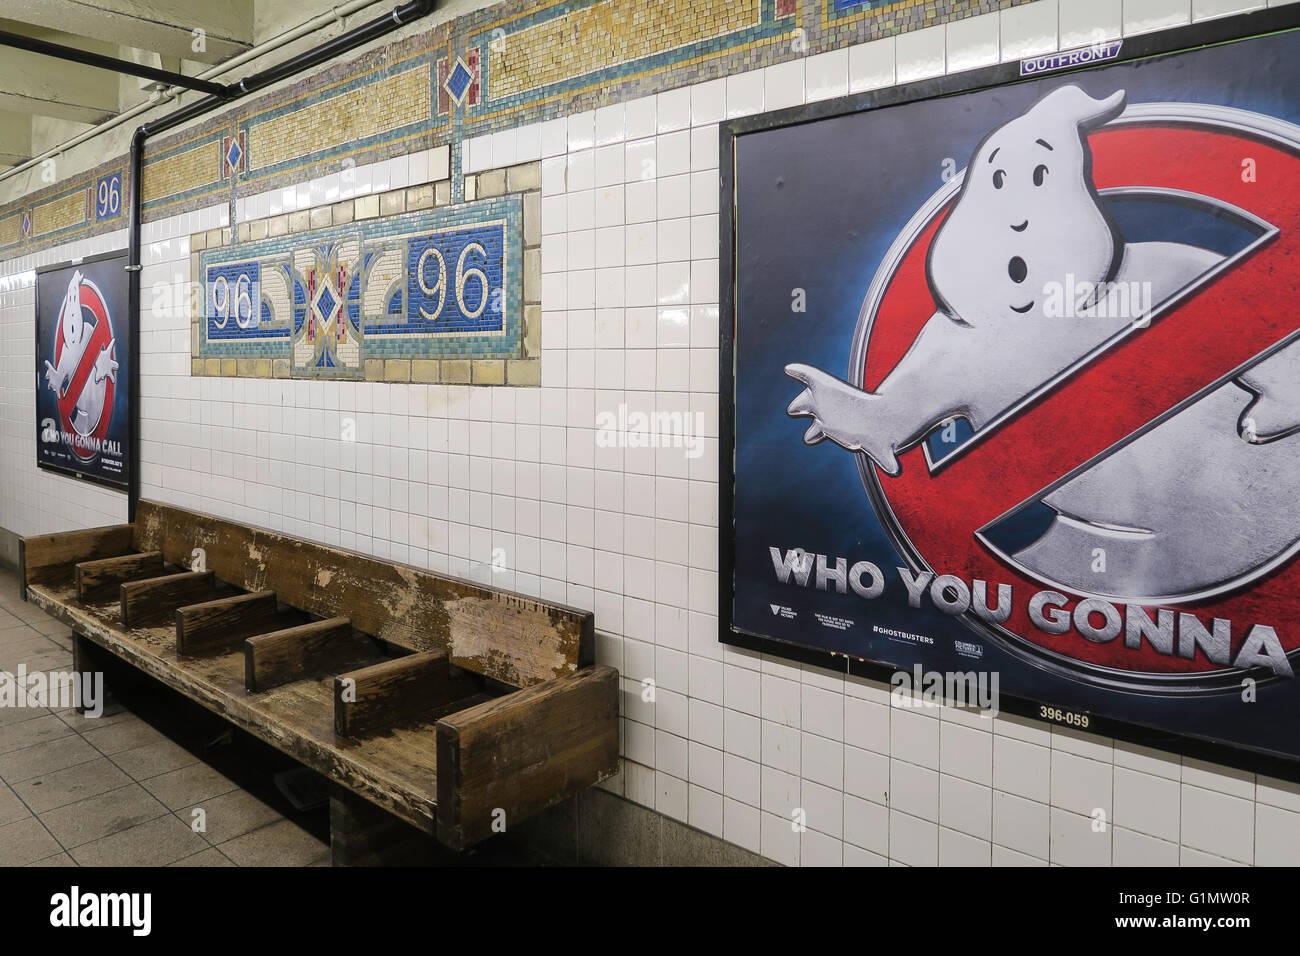 96th Street Subway Platform, NYC - Stock Image